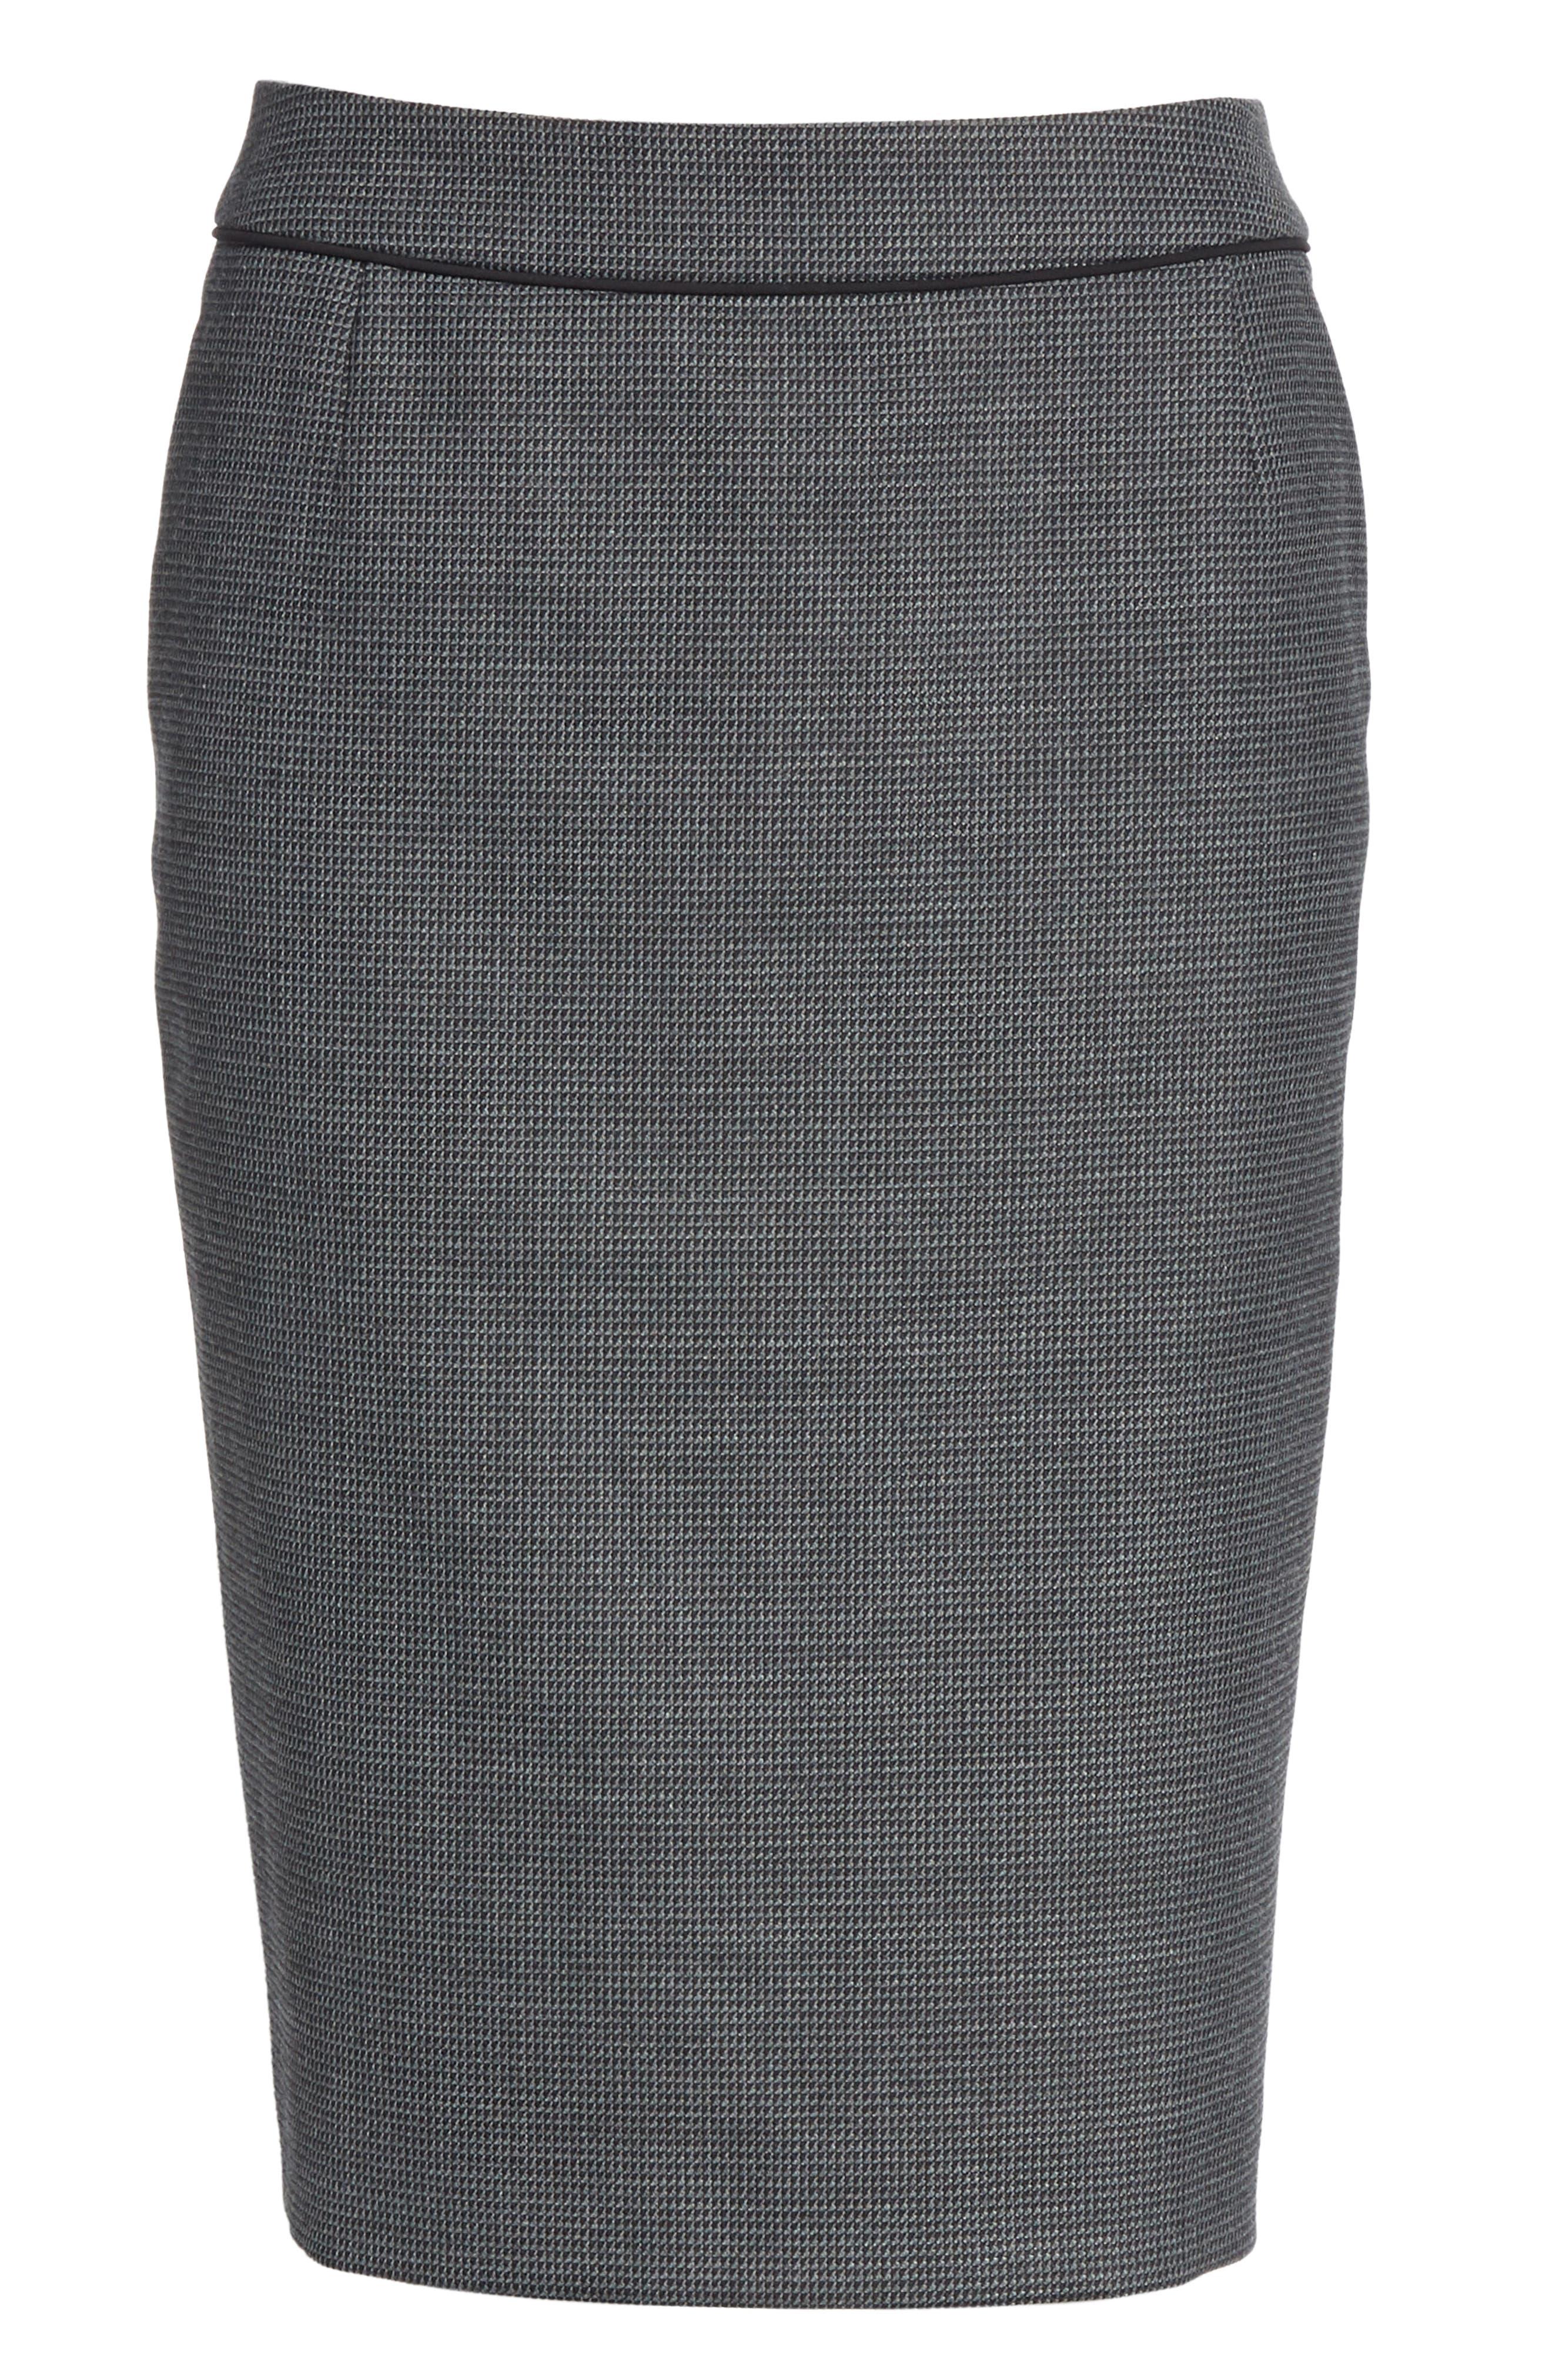 Vorita Geometric Wool Blend Suit Skirt,                             Alternate thumbnail 6, color,                             GREY FANTASY